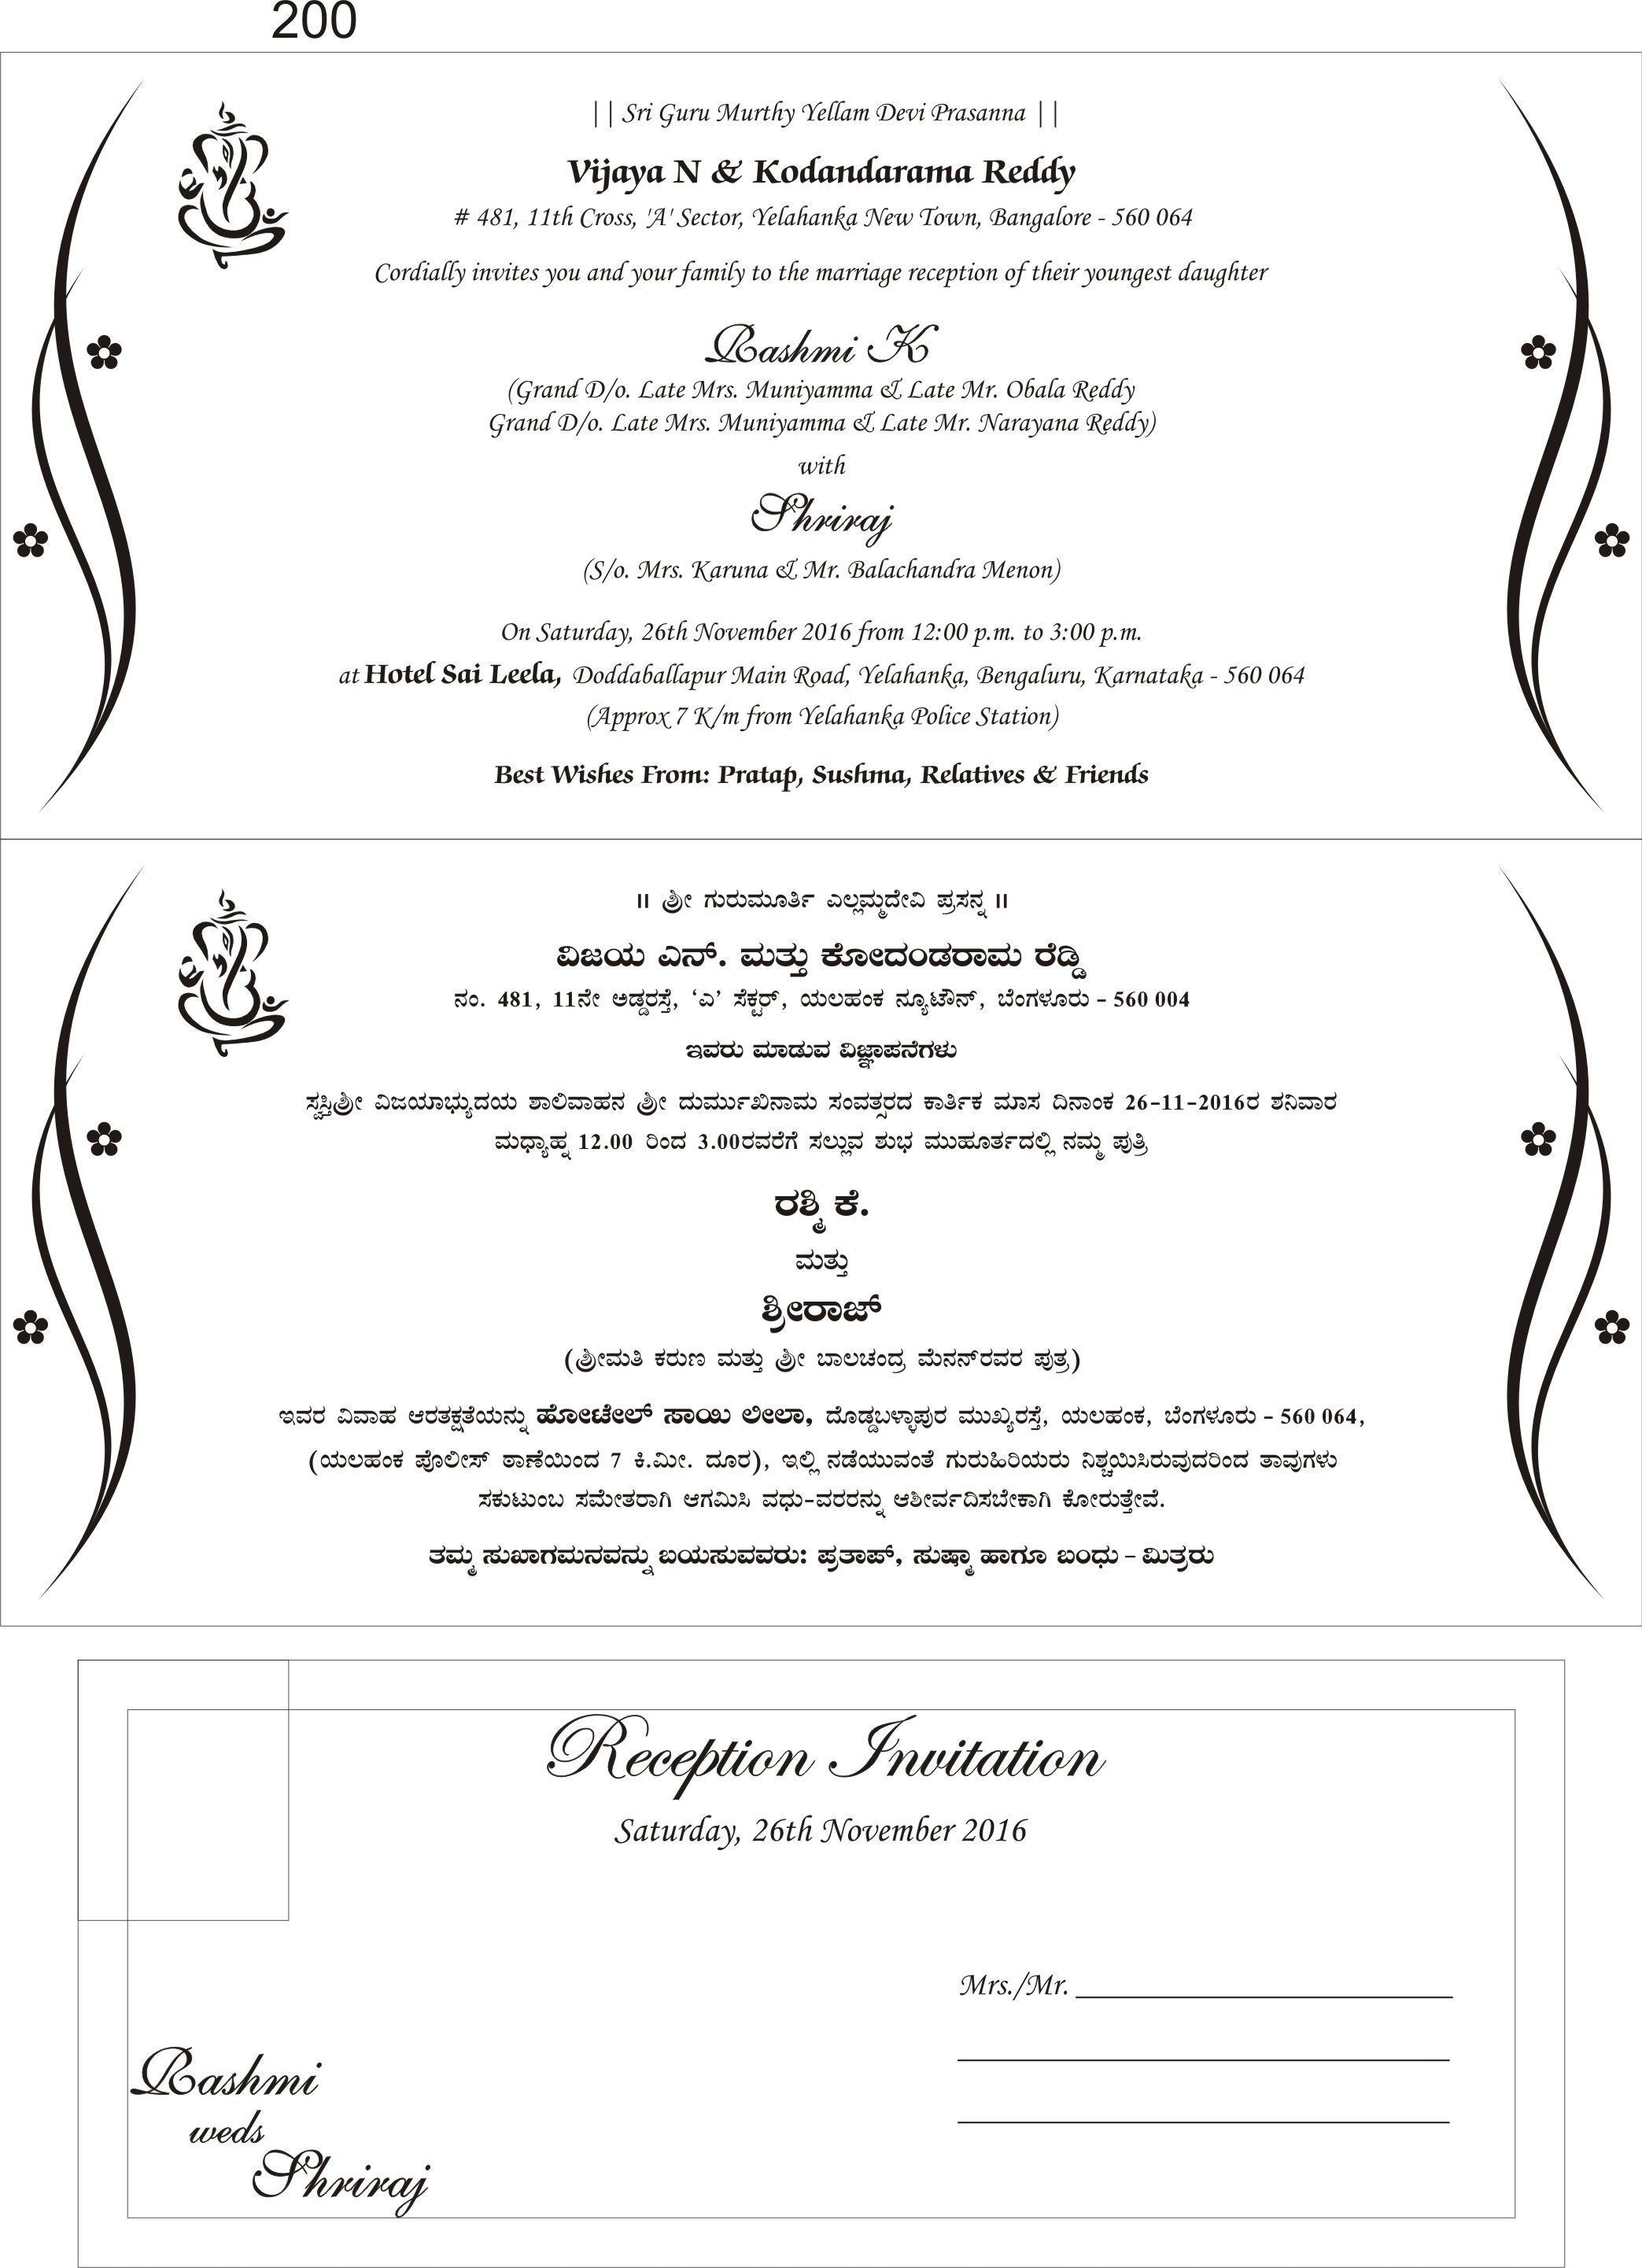 Marriage Invitation Card Matter In Kannada In 2021 Invitation Card Format Marriage Invitation Card Wedding Invitation Cards